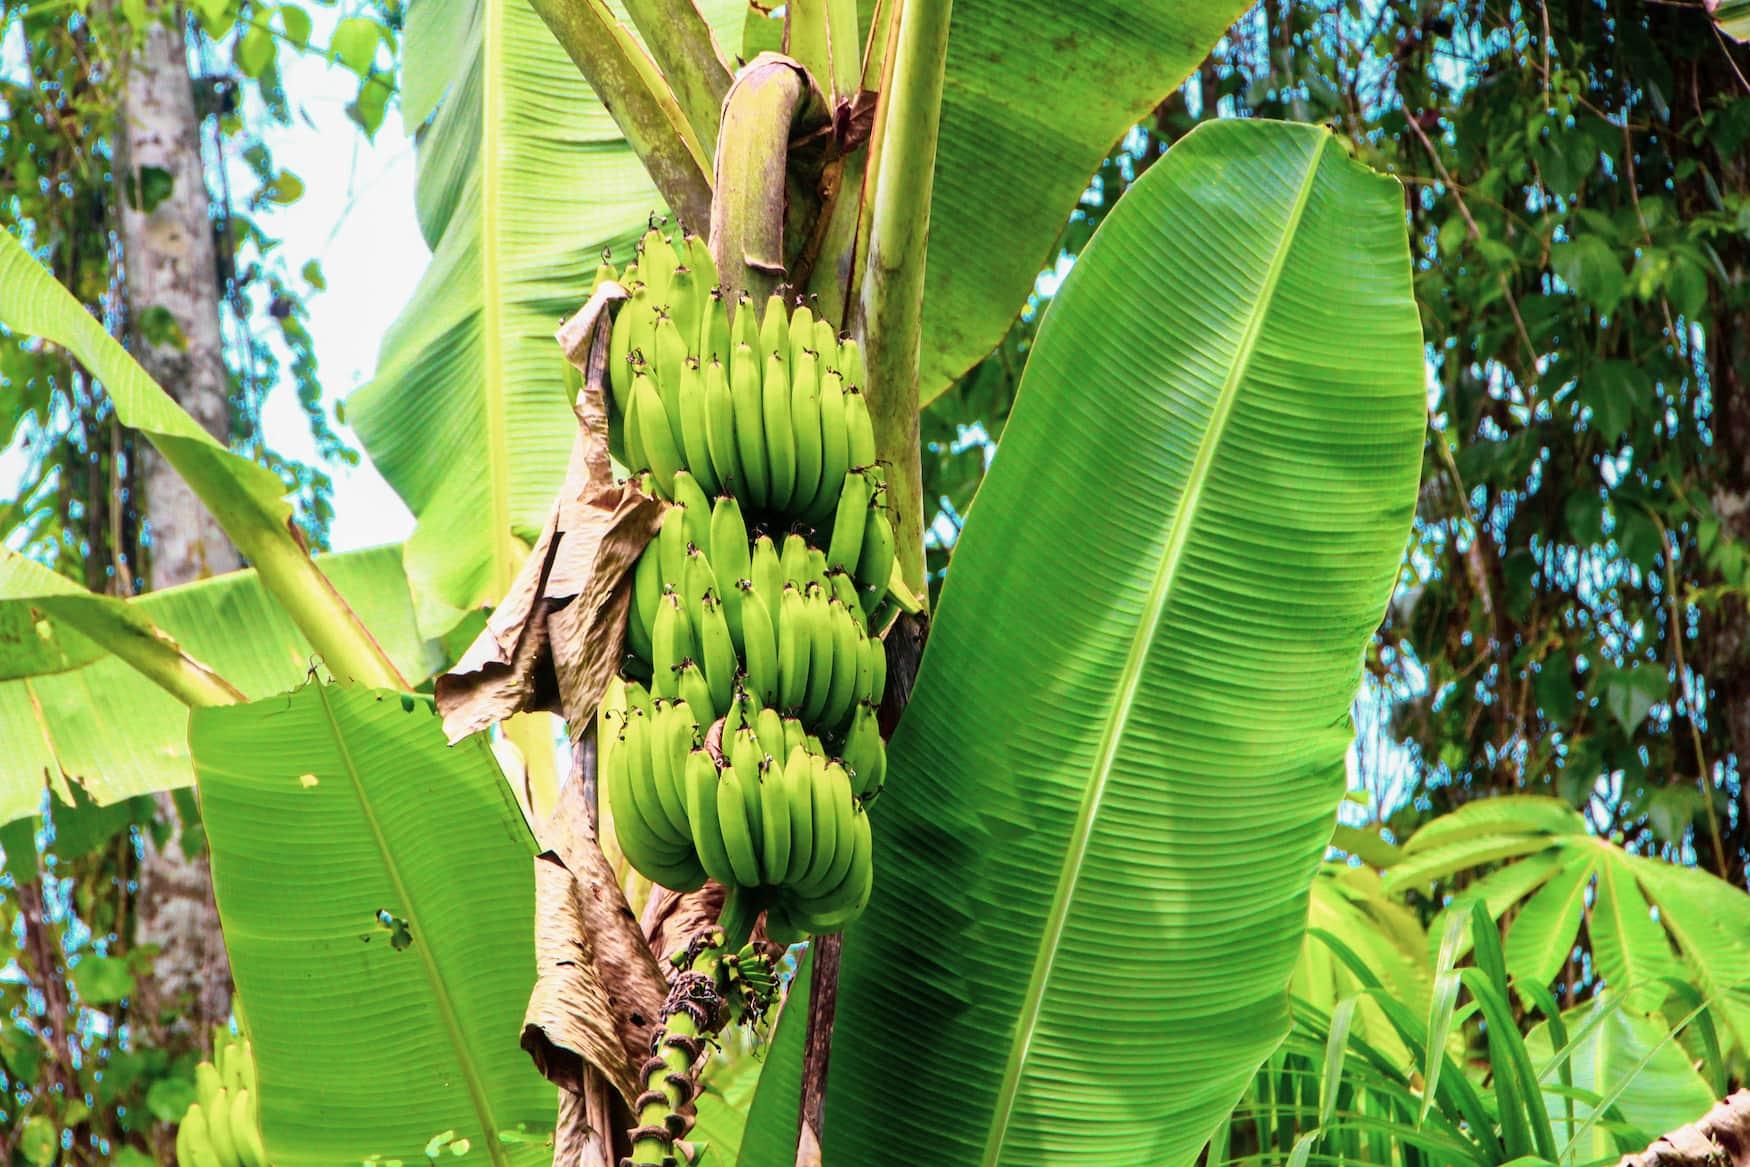 Bananenstaude in Costa Rica